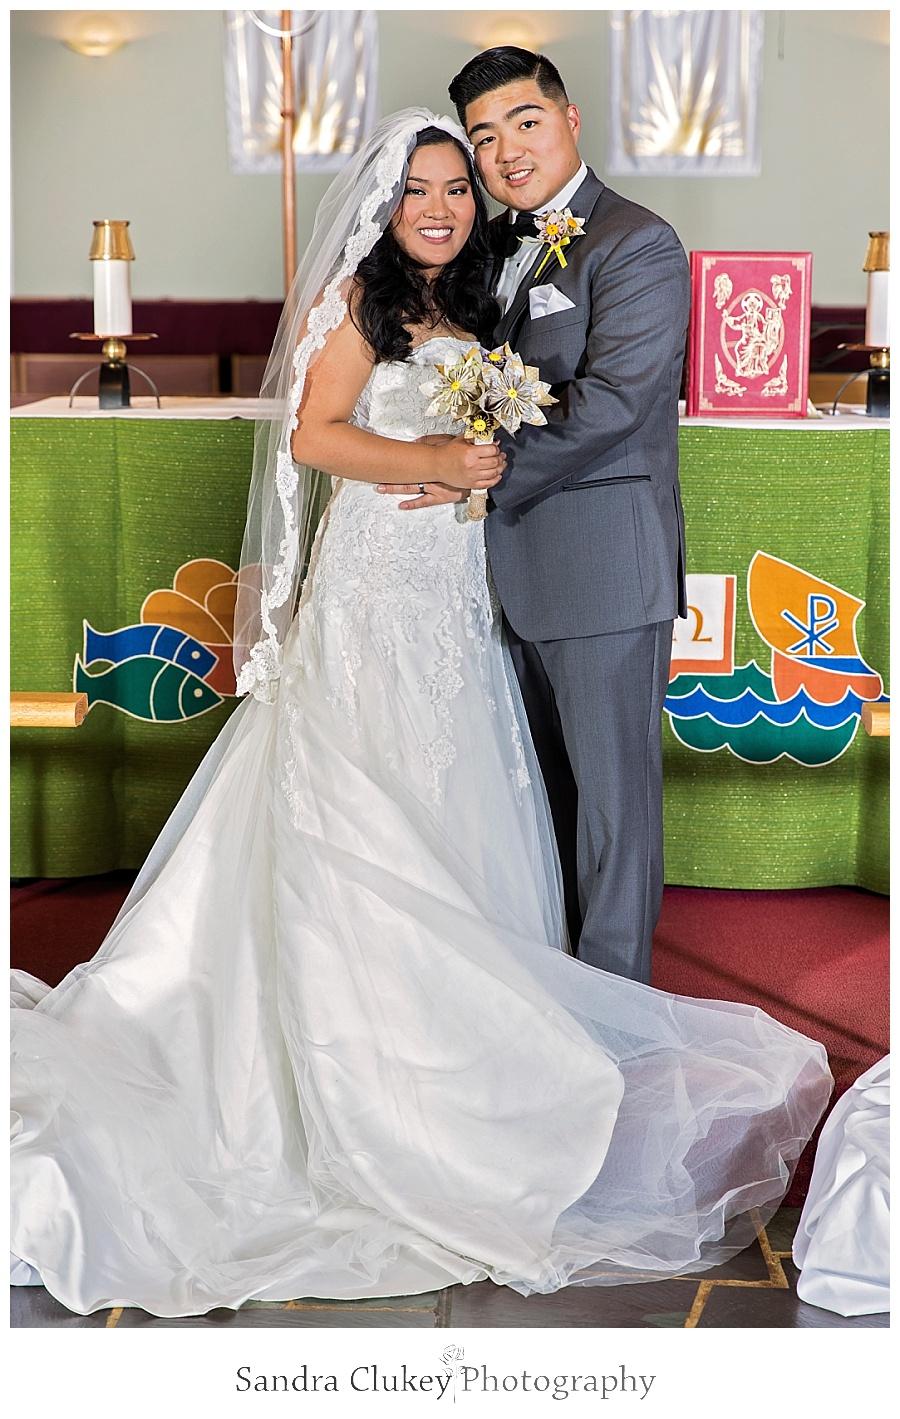 Euphoric bride and groom